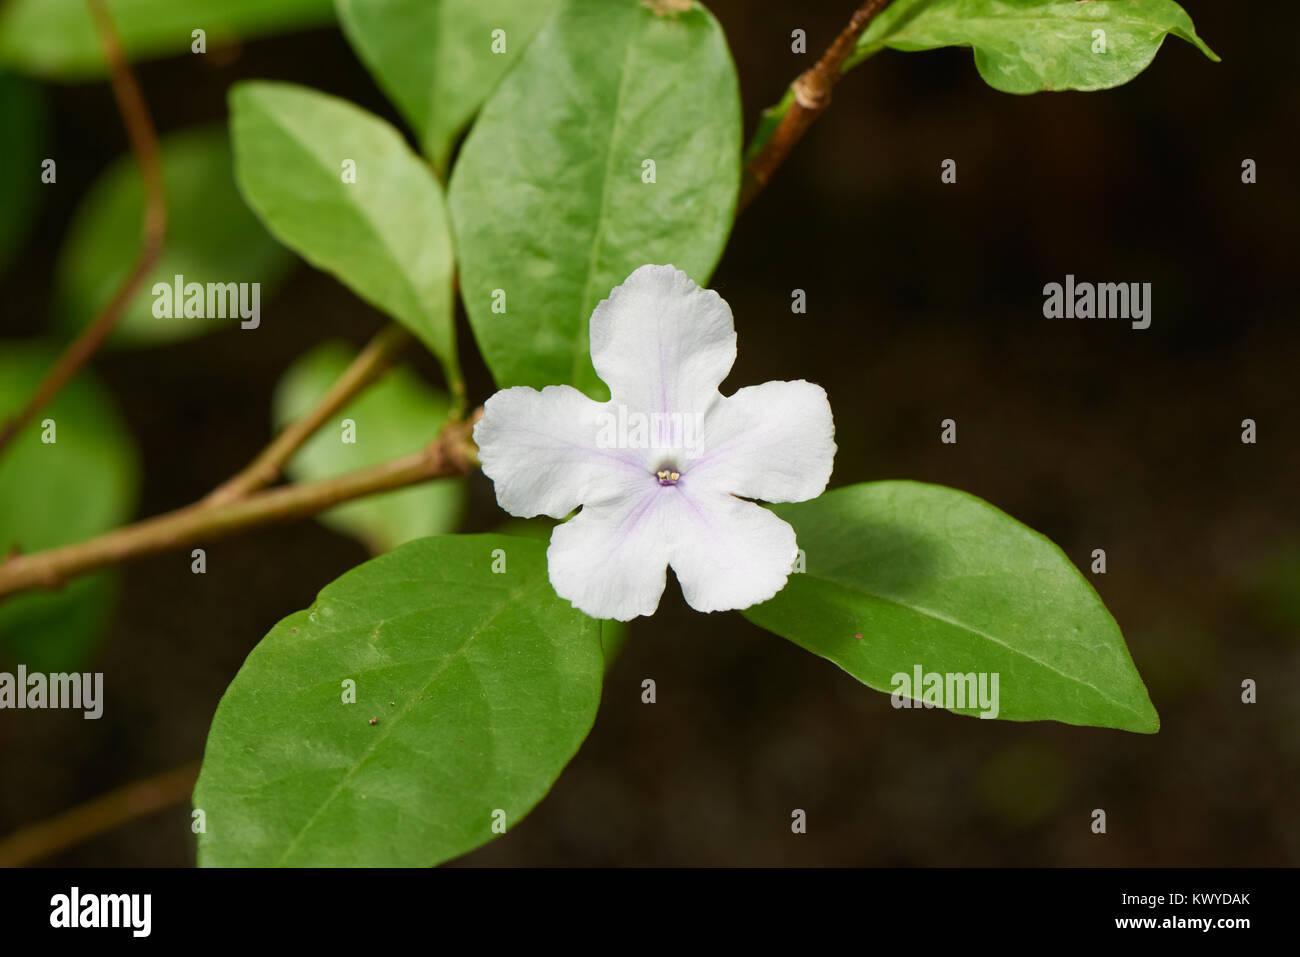 Brunfelsia australis flower. Brunfelsia is a genus of flowering plants in the family Solanaceae. - Stock Image